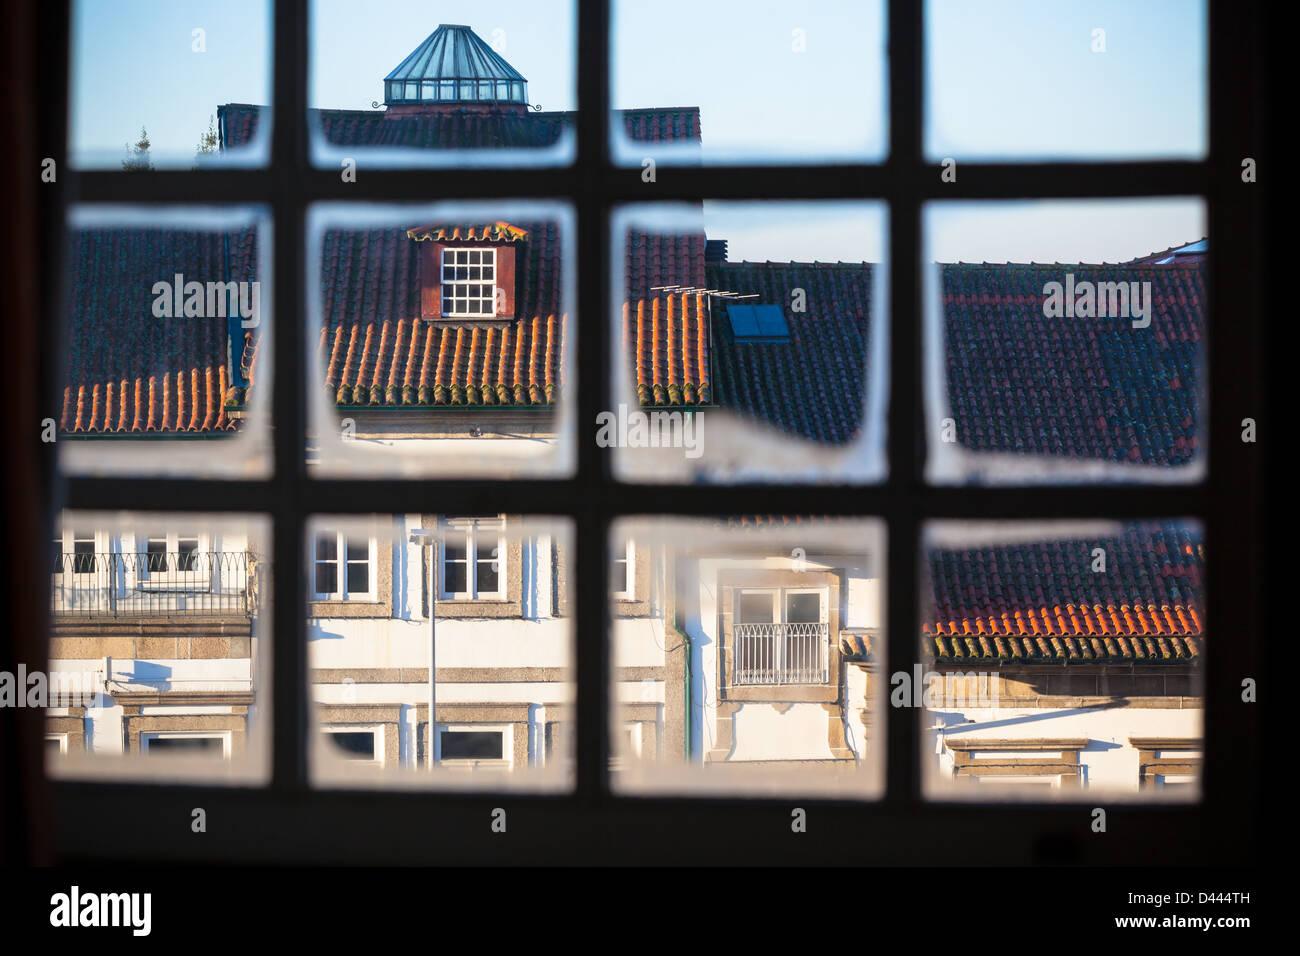 misted window stockfotos misted window bilder alamy. Black Bedroom Furniture Sets. Home Design Ideas